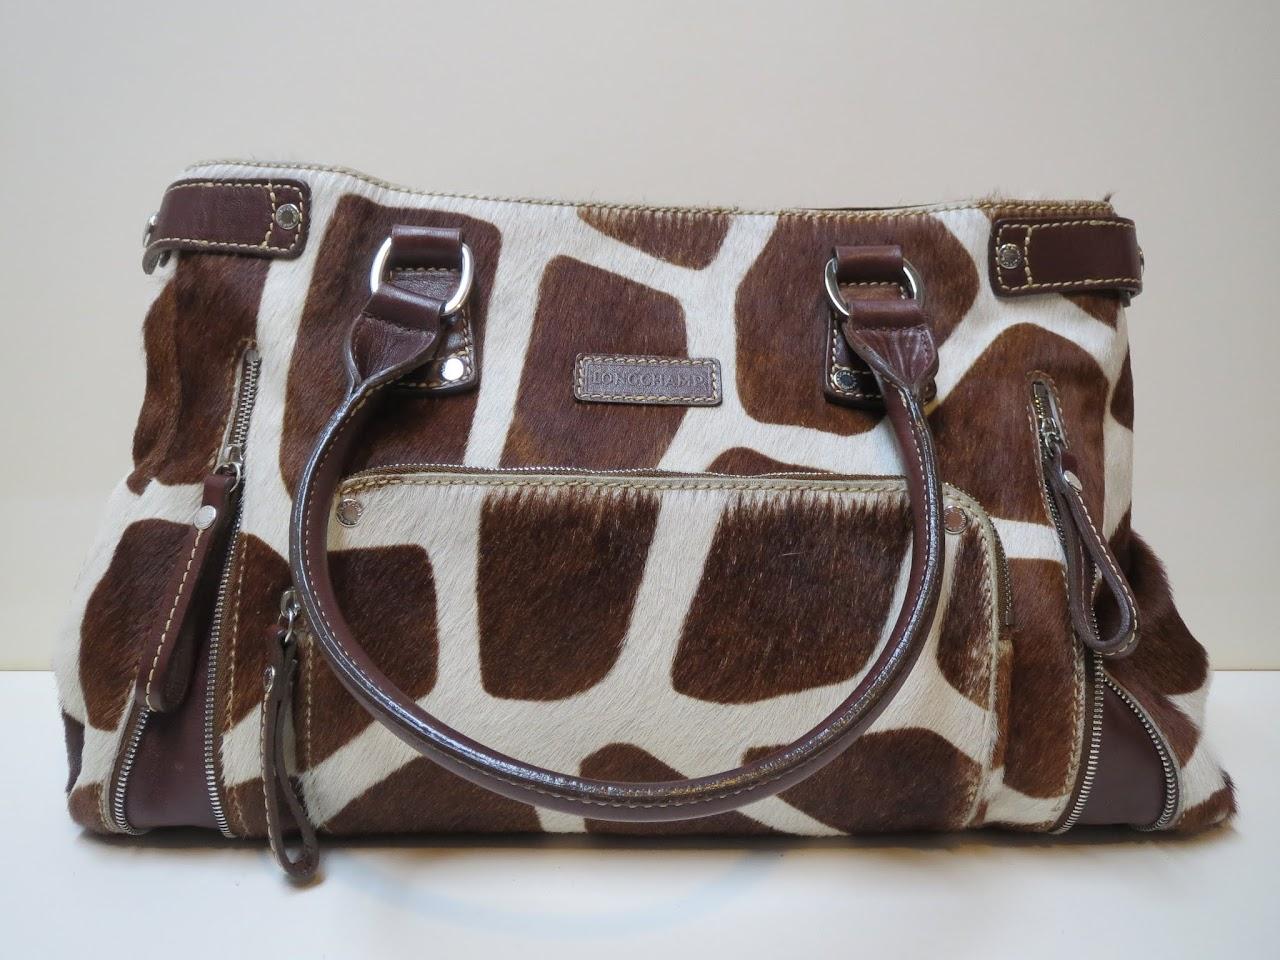 Longchamp Giraffe-Print Hide Shoulder Bag